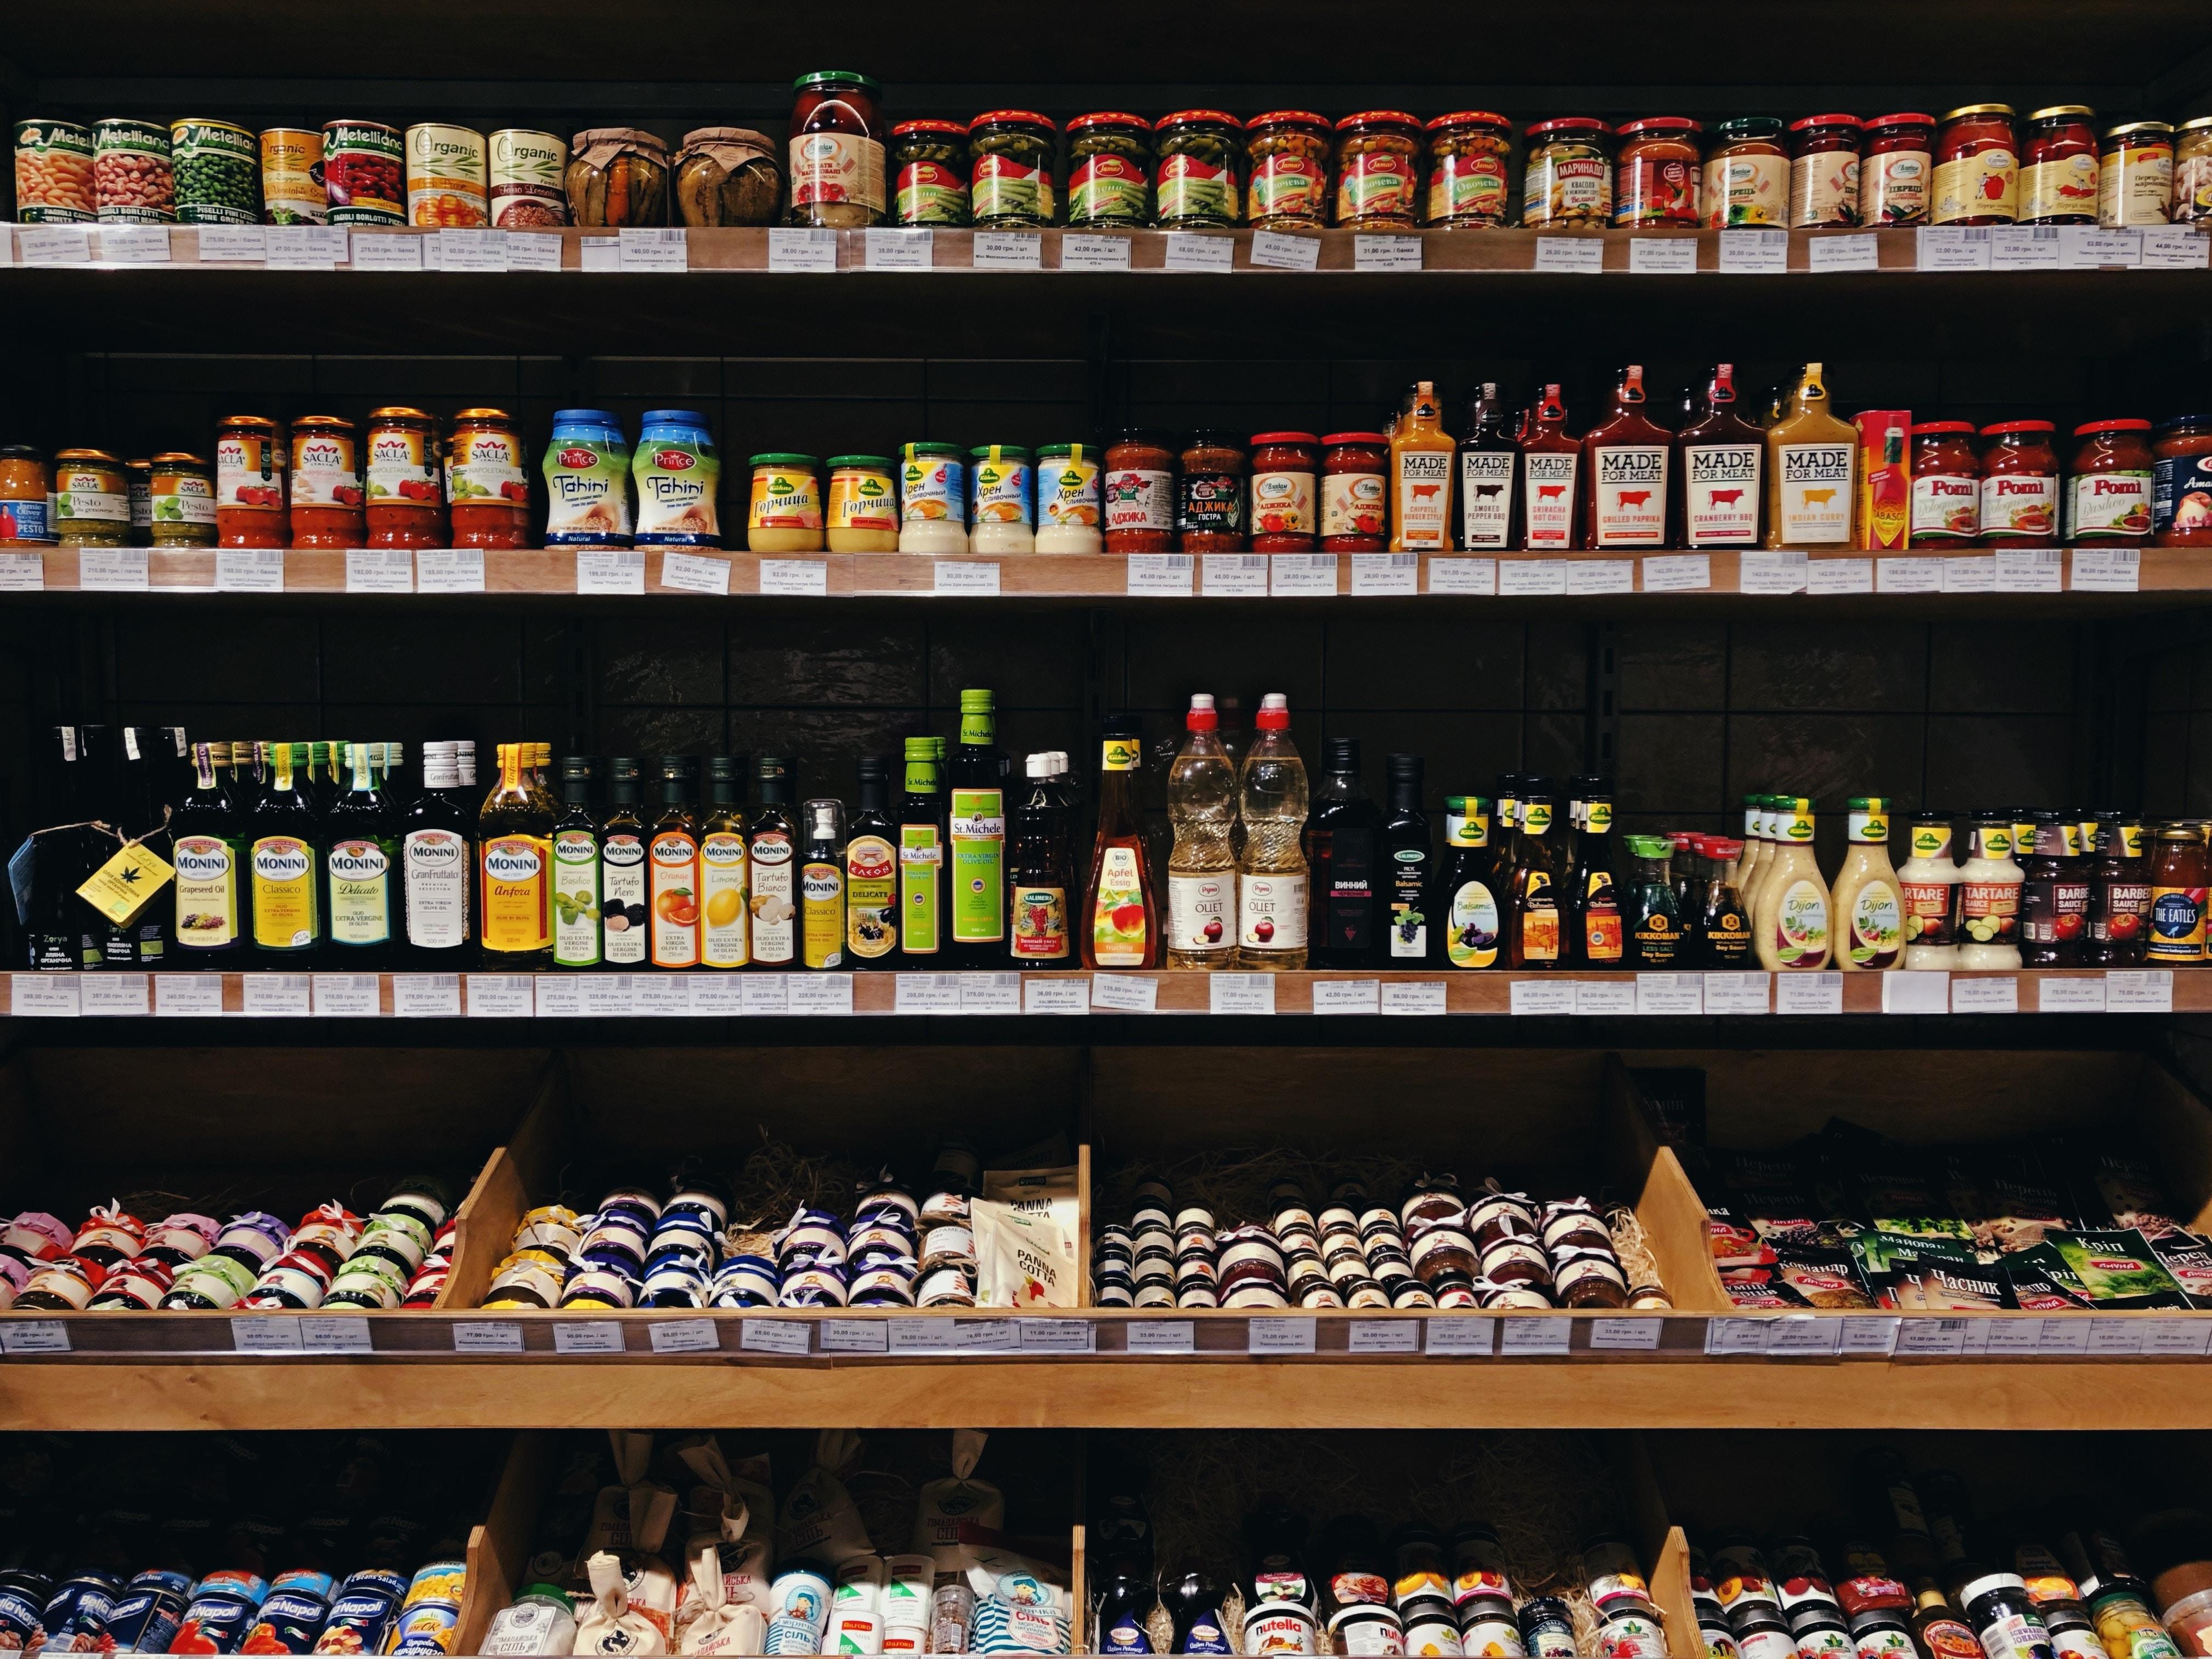 nutrition label|nutrition-label|nutrition-labels